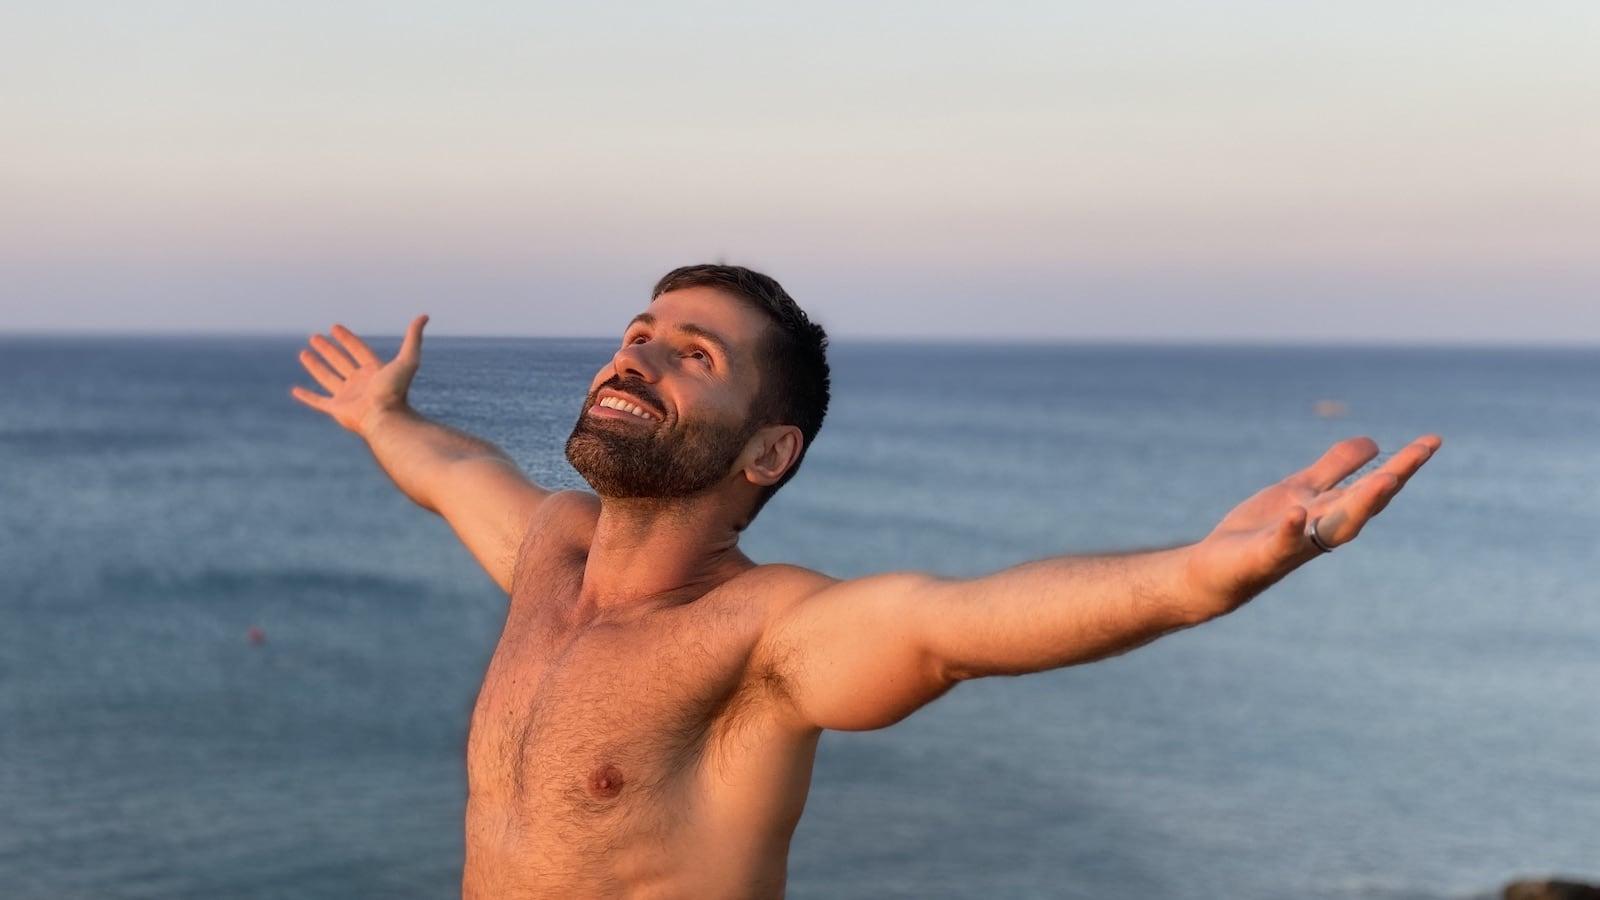 Elia gay beach in Mykonos